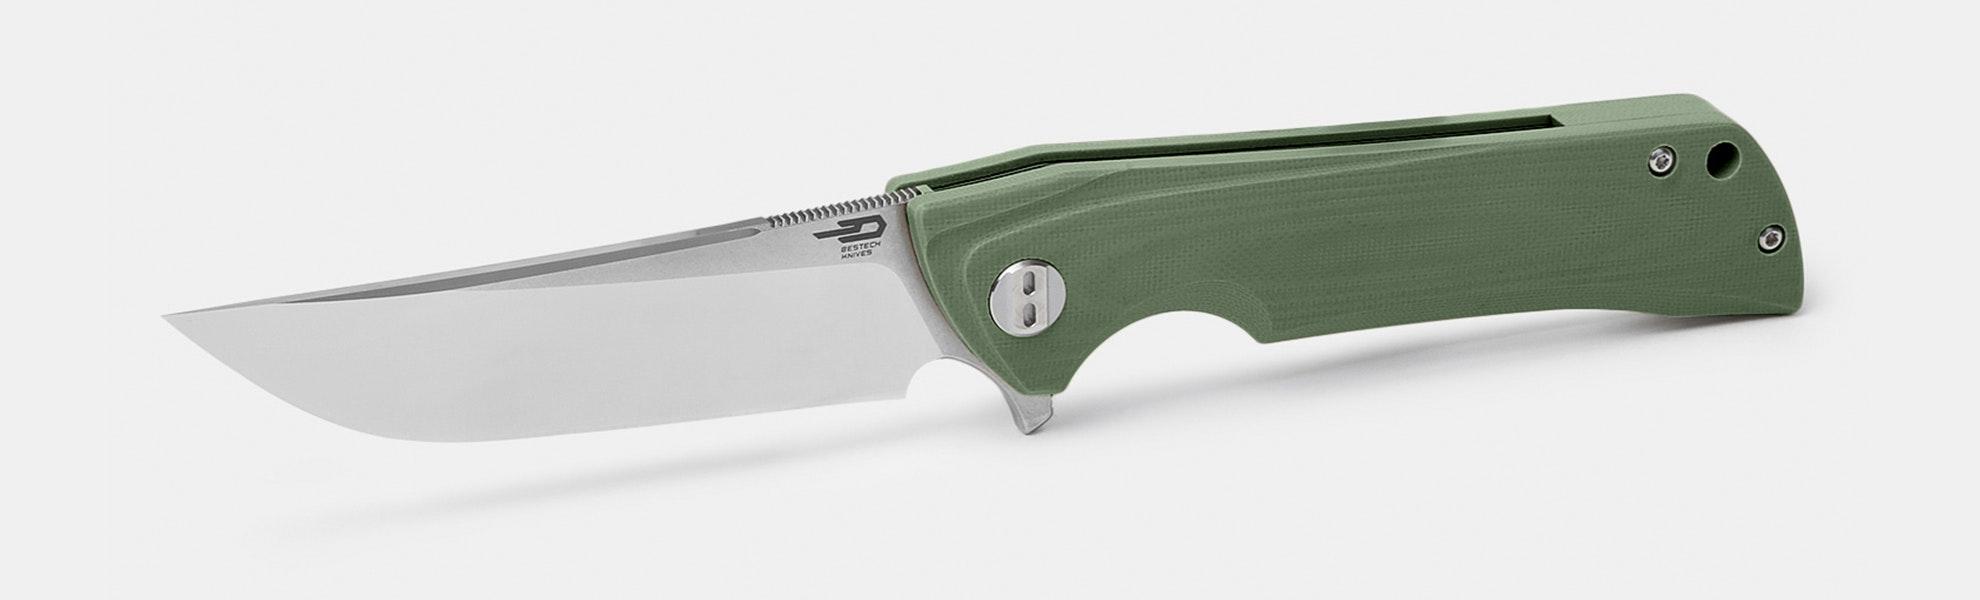 Bestech Paladin Knife (OD Green)–Massdrop Exclusive